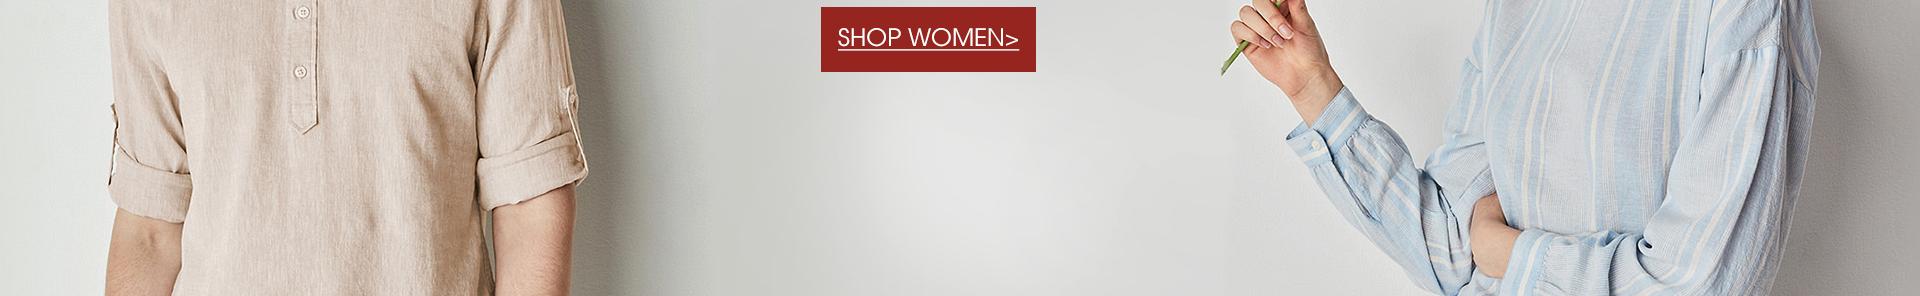 Women's linen collection